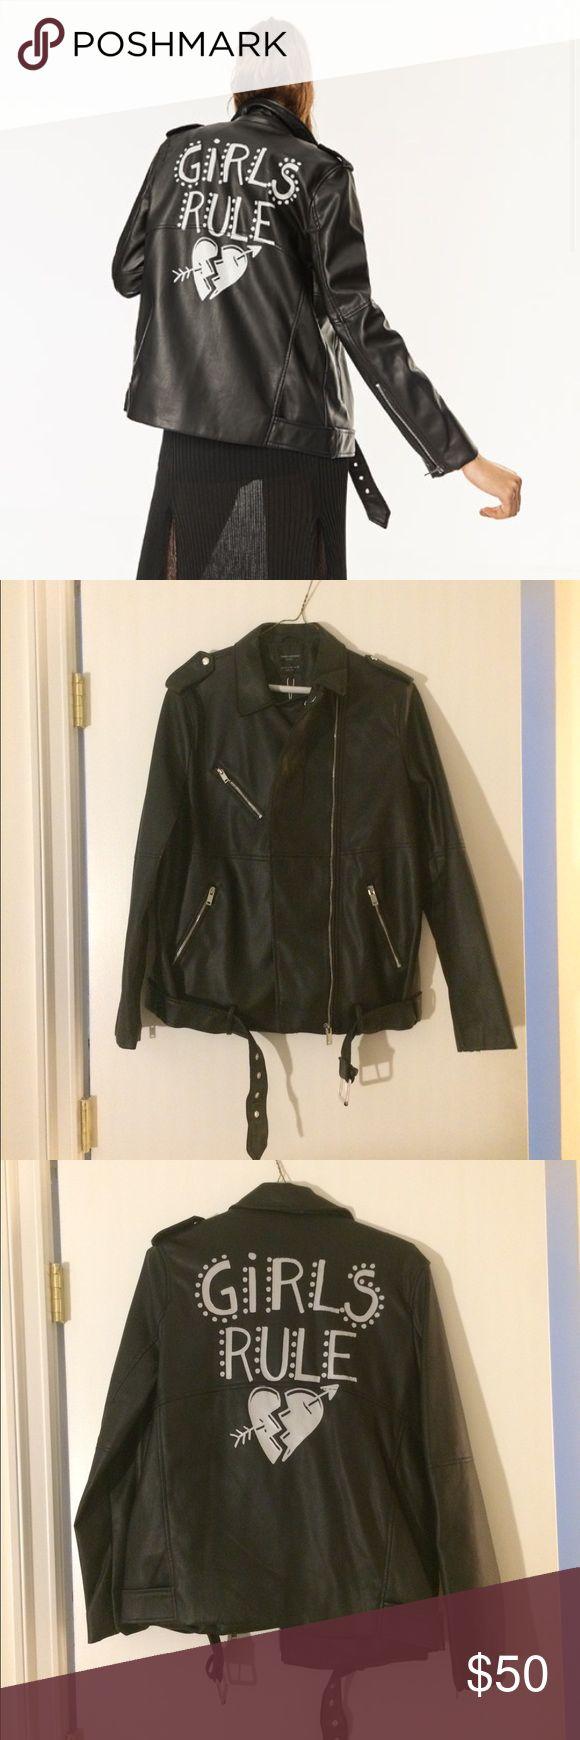 Black Faux Leather Biker Jacket - Girls Rule! Black Faux Leather jacket from Zara.  Brand new super cute, just didn't fit me. Zara Jackets & Coats